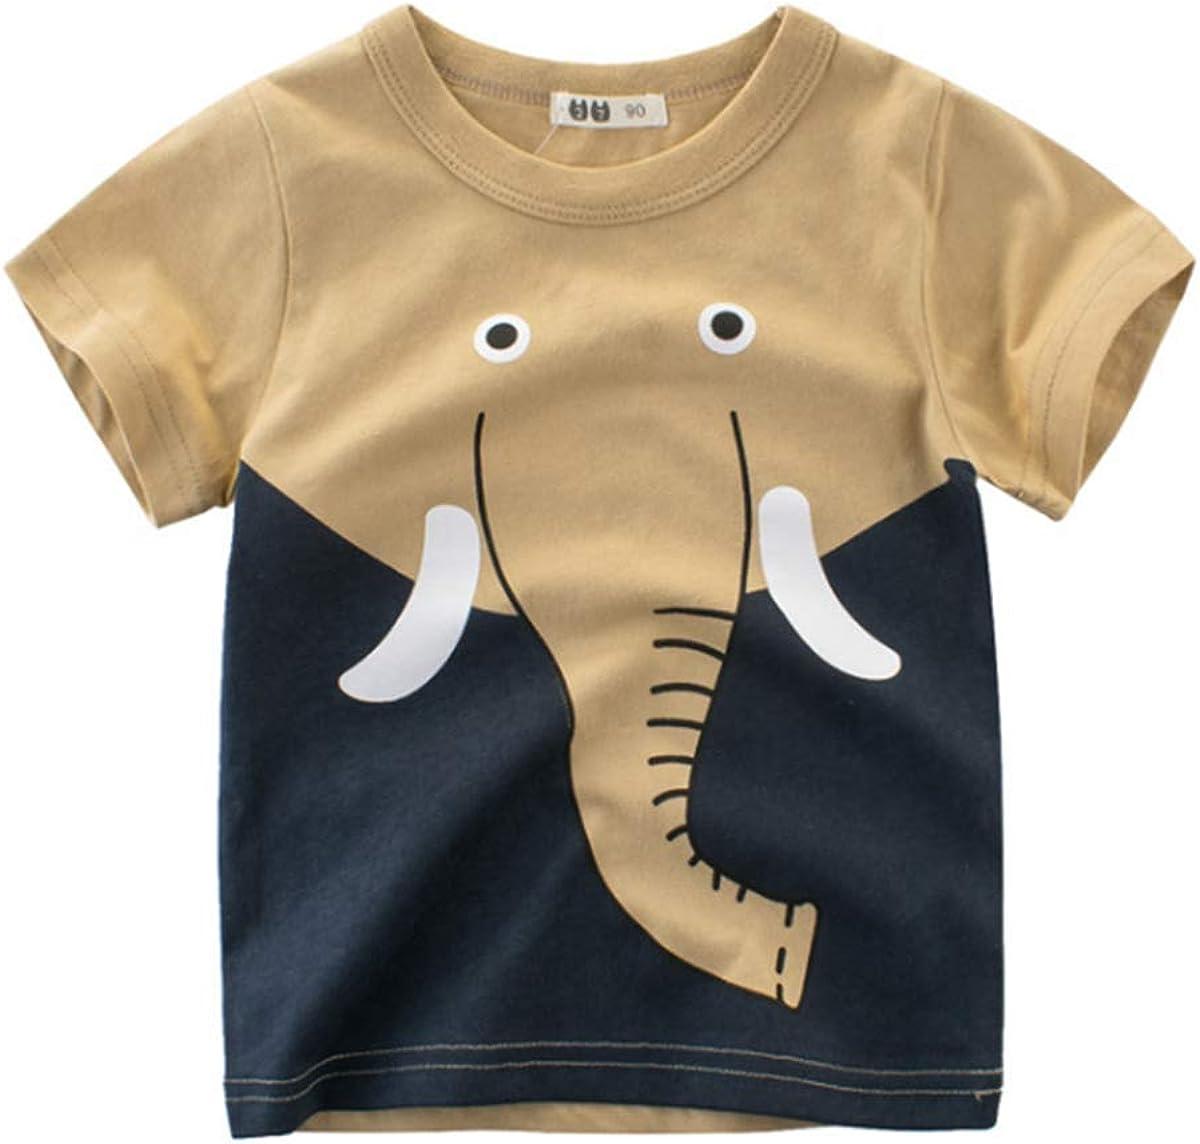 WINZIK Toddler Kids Boys Summer Cotton Short Sleeve Shirt Cartoon Graphic Crewneck Tee Tops Blouse Outfit Clothes